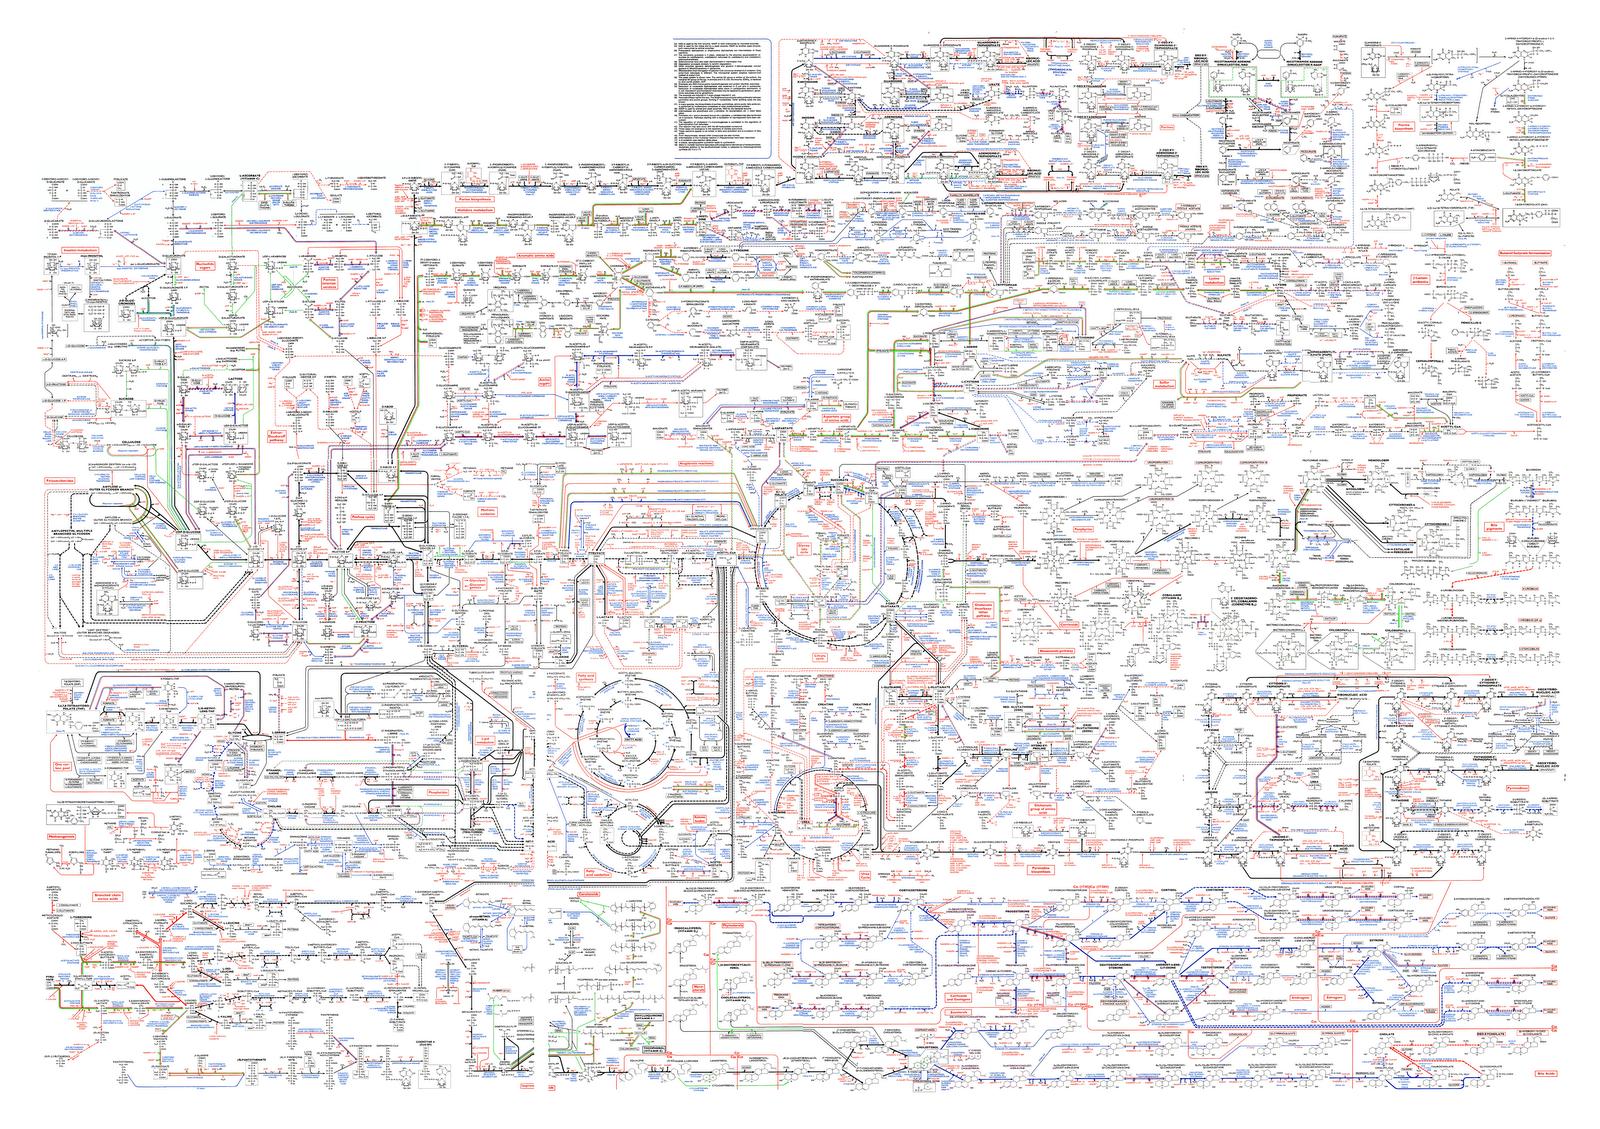 Roche Biochemical Pathways Wall Chart   Interior Design